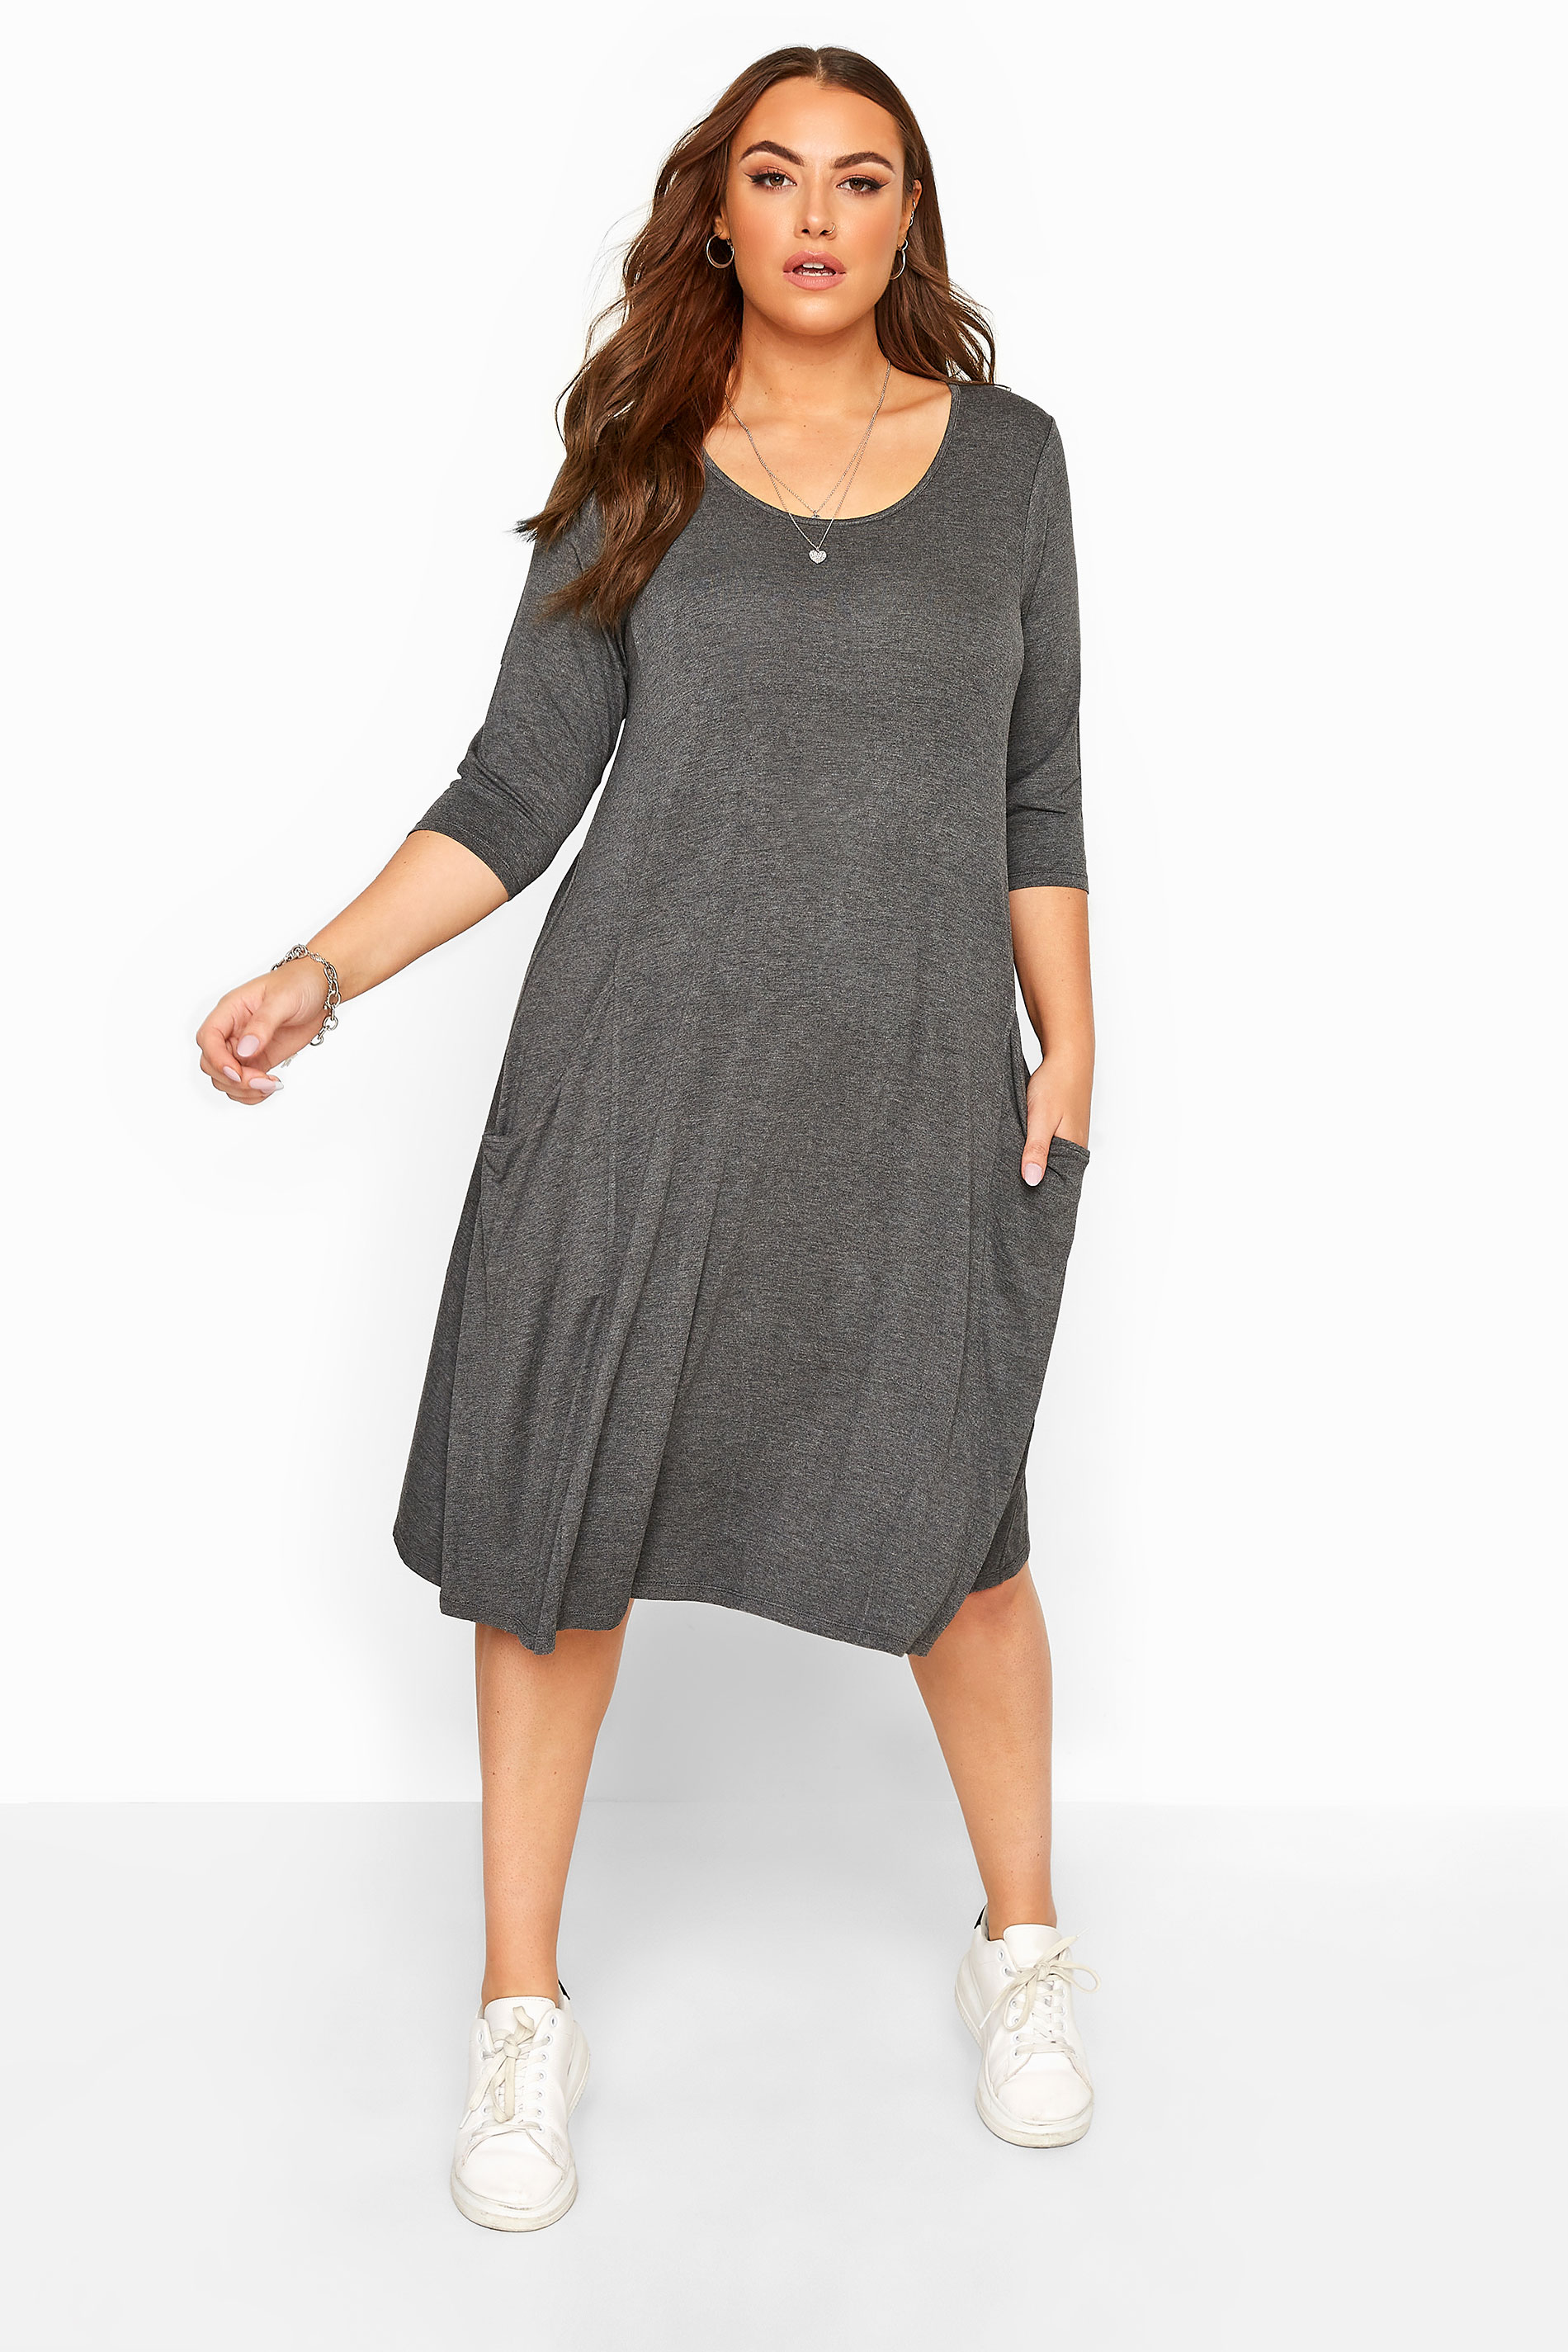 Charcoal Grey Drape Pocket Dress